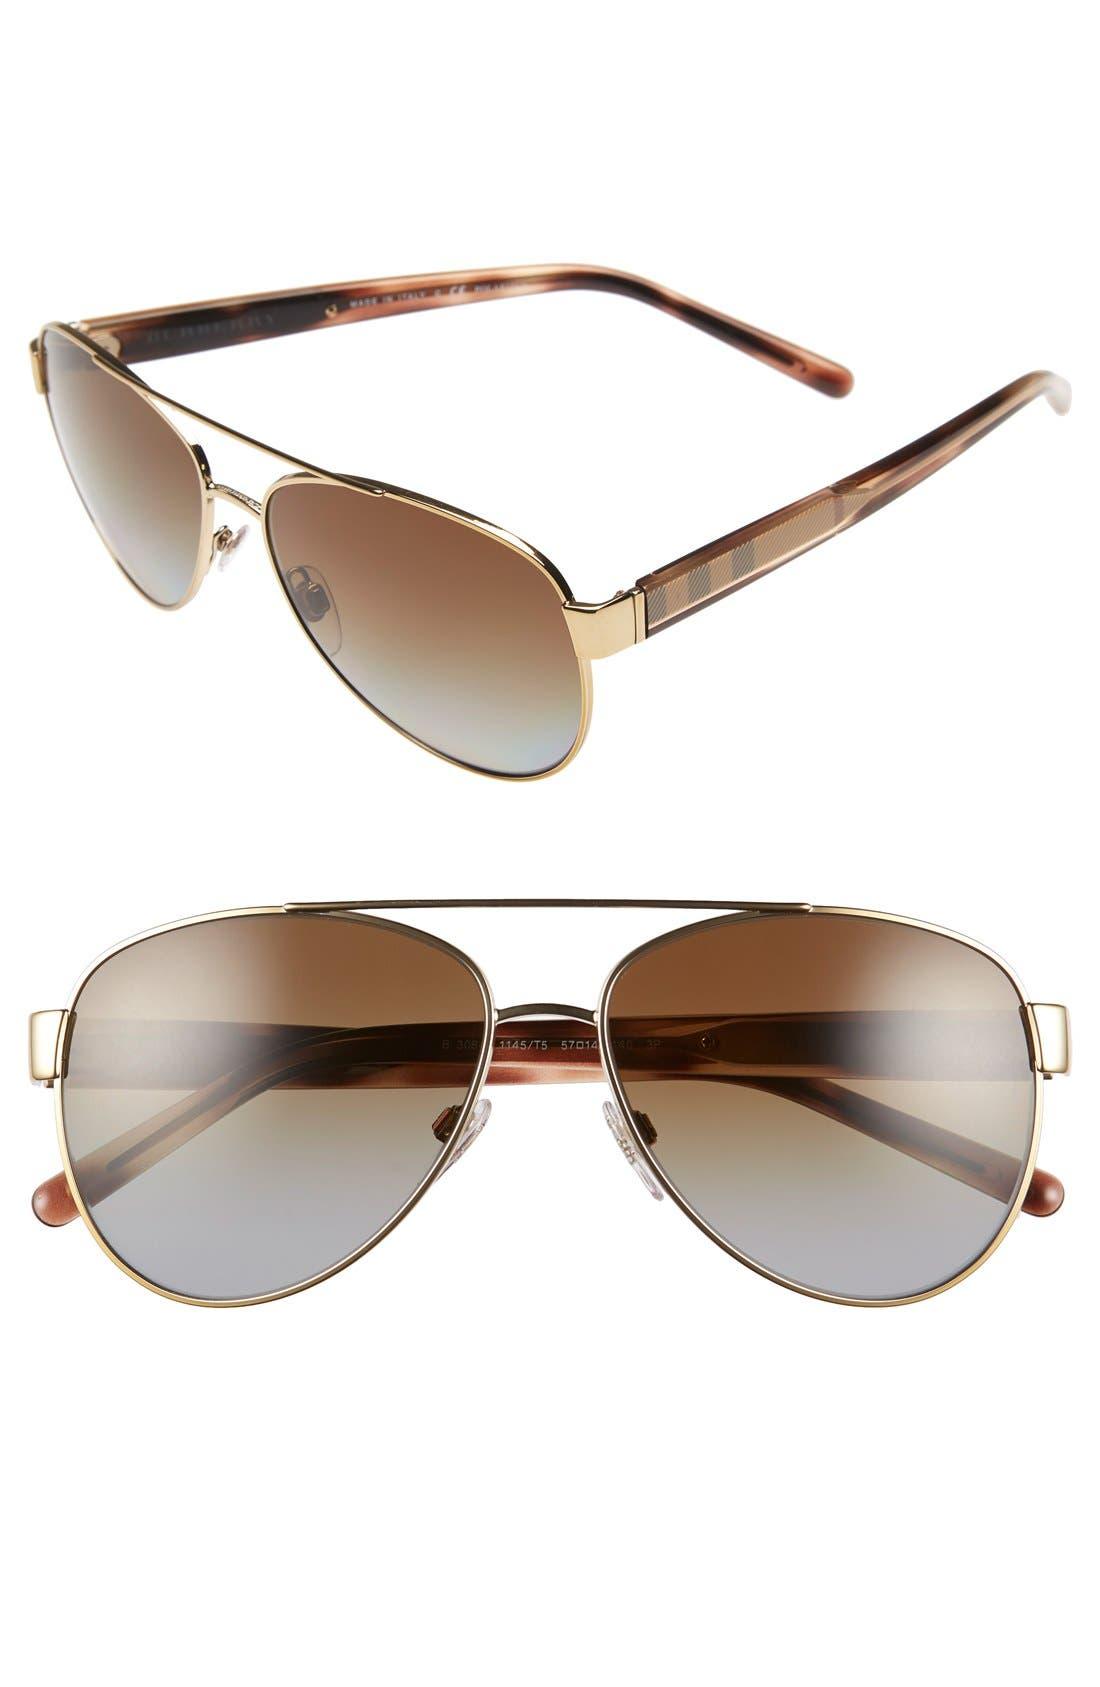 57mm Polarized Aviator Sunglasses,                             Main thumbnail 3, color,